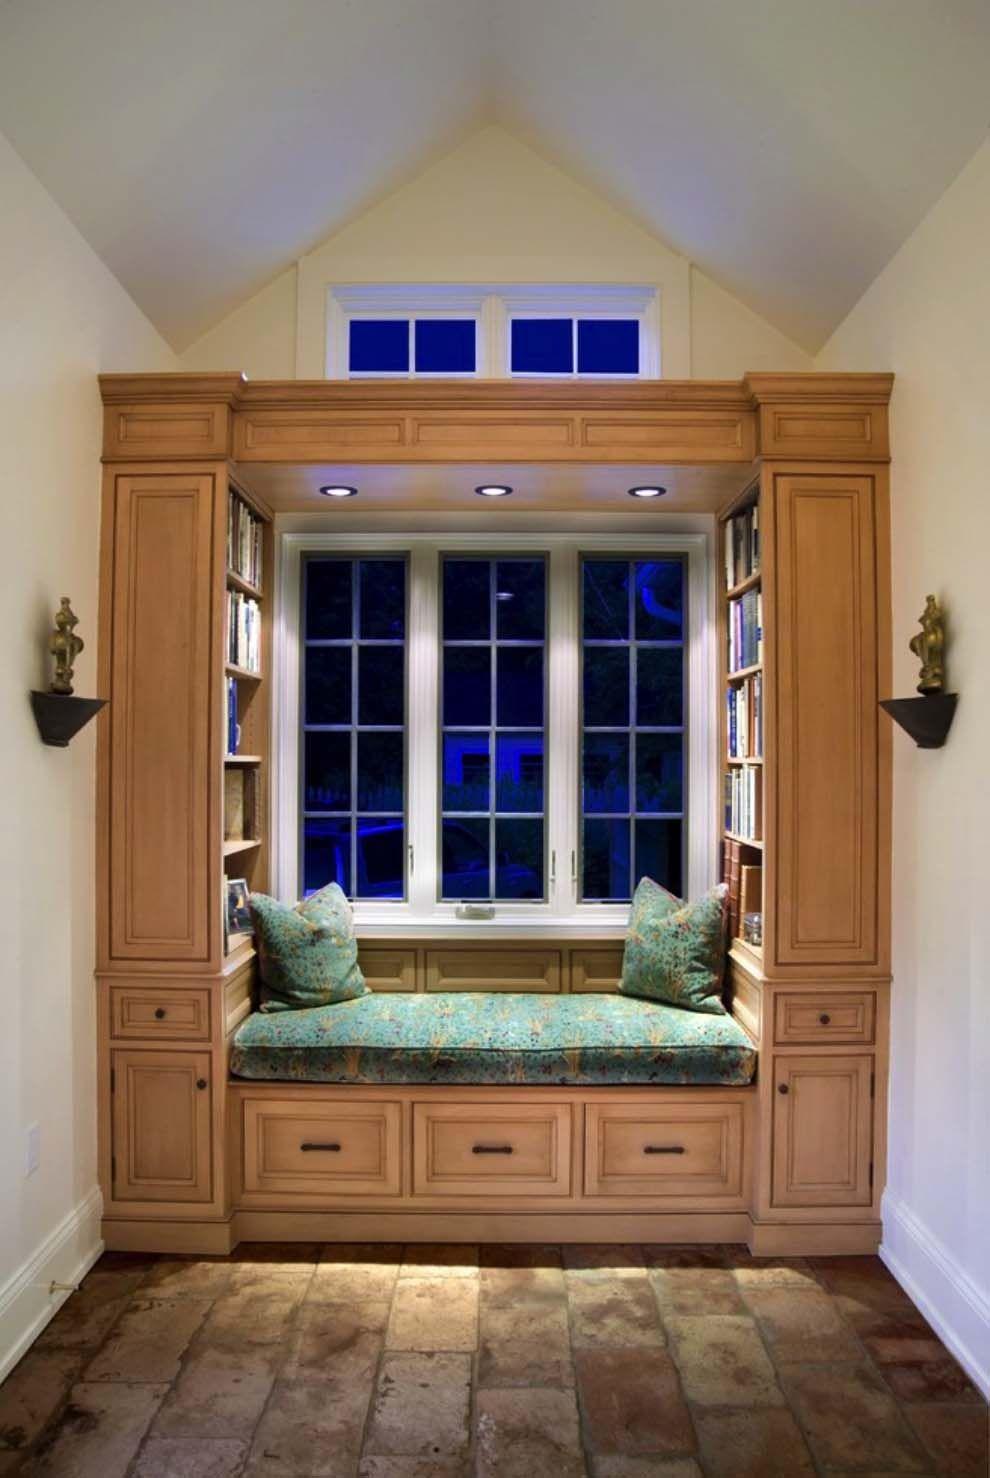 Window Seat Library: 36 Fabulous Home Libraries Showcasing Window Seats